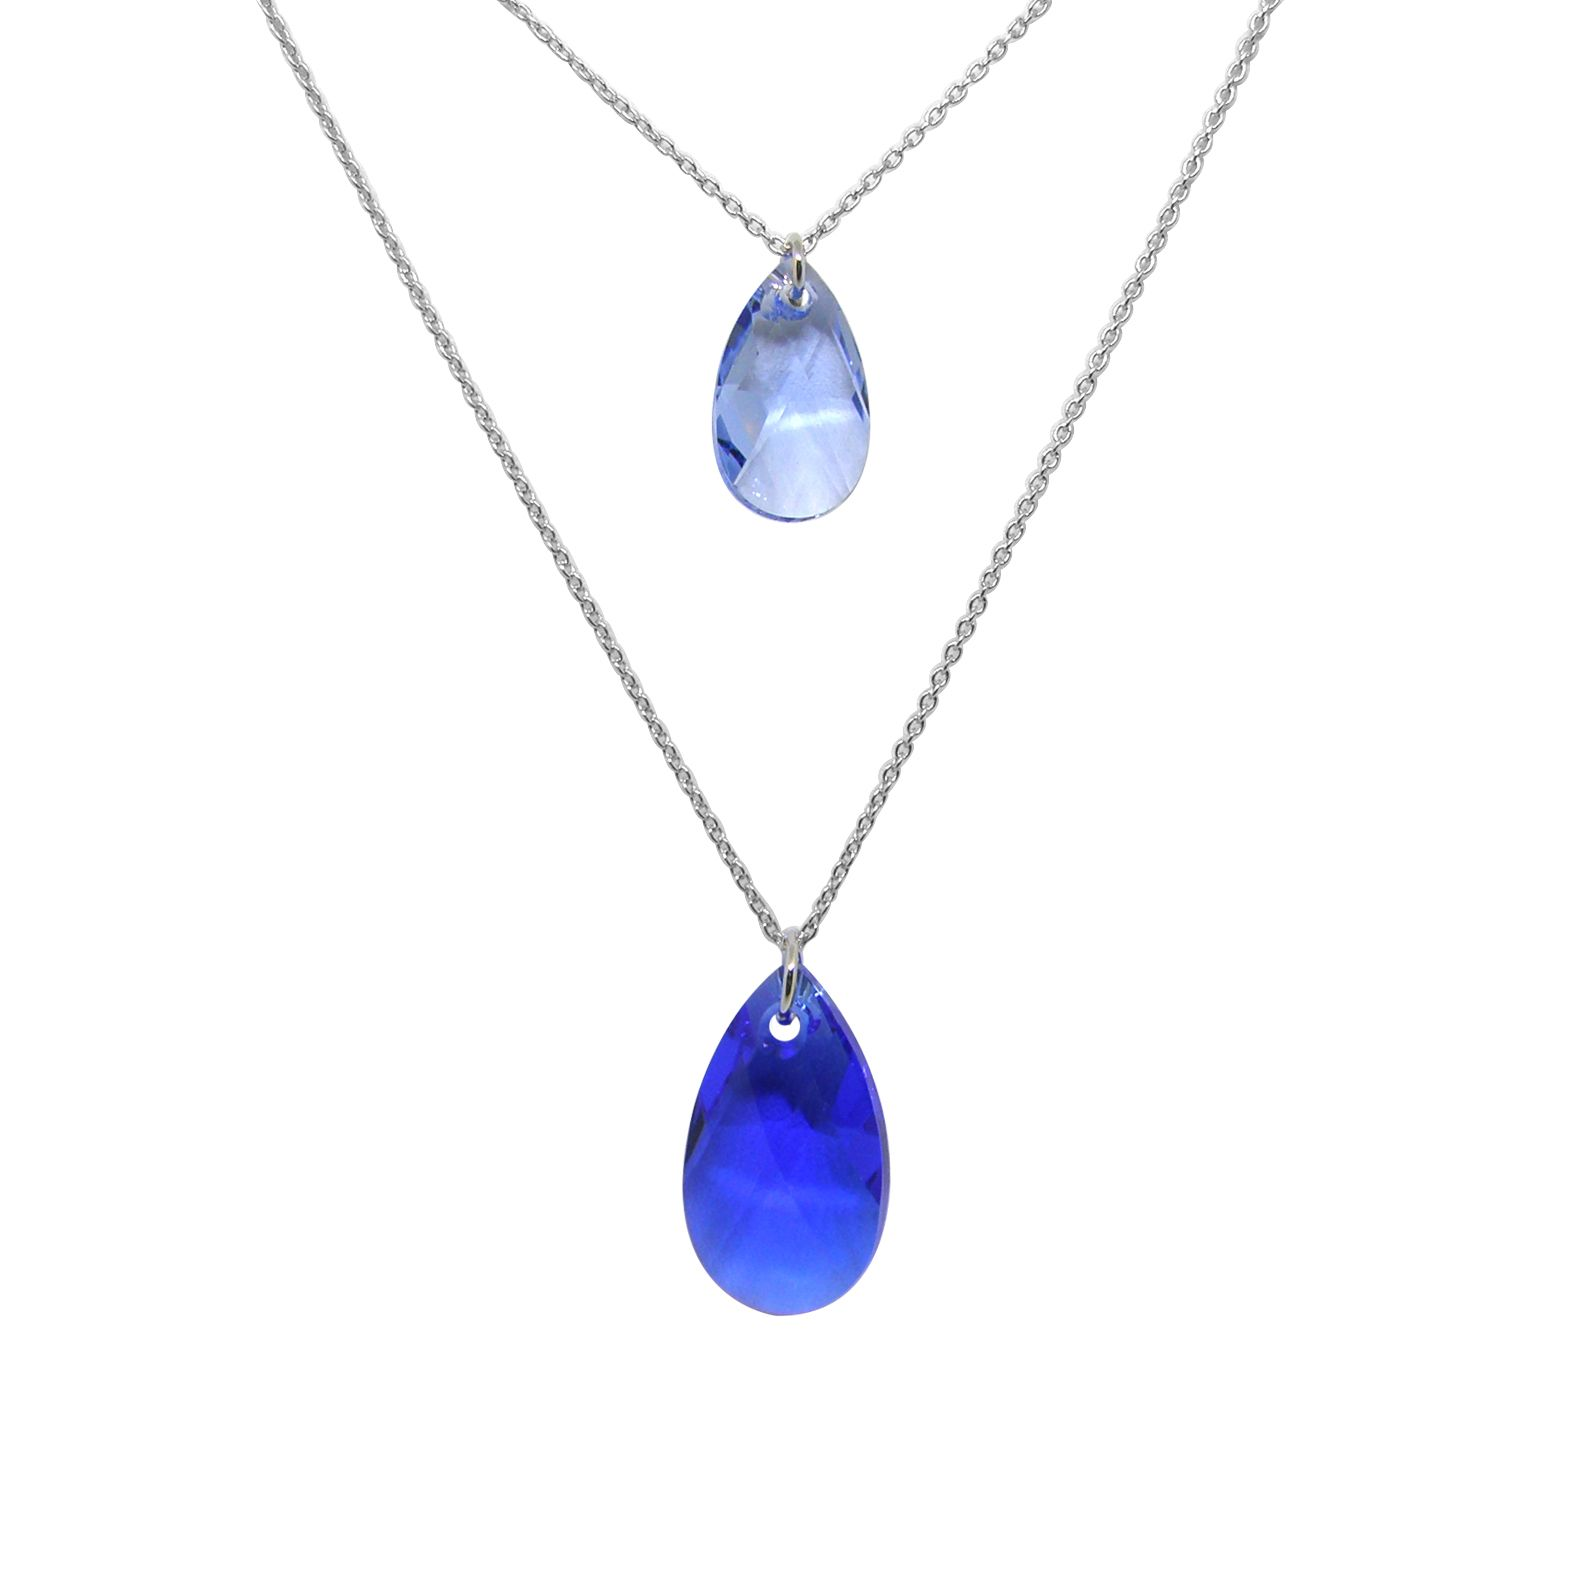 Collier Indicolite Sabine en argent et cristaux Swarovski bleus